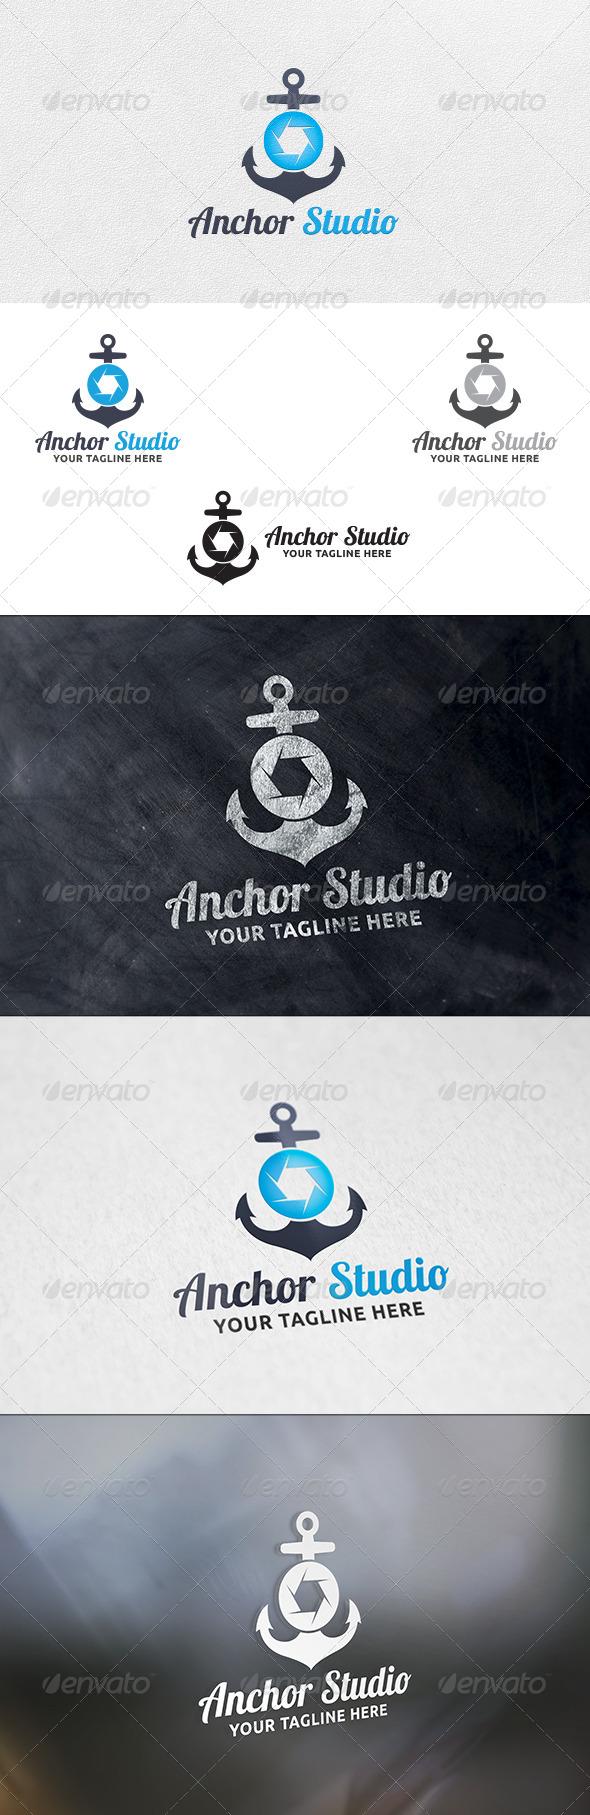 Anchor Studio - Logo Template - Symbols Logo Templates